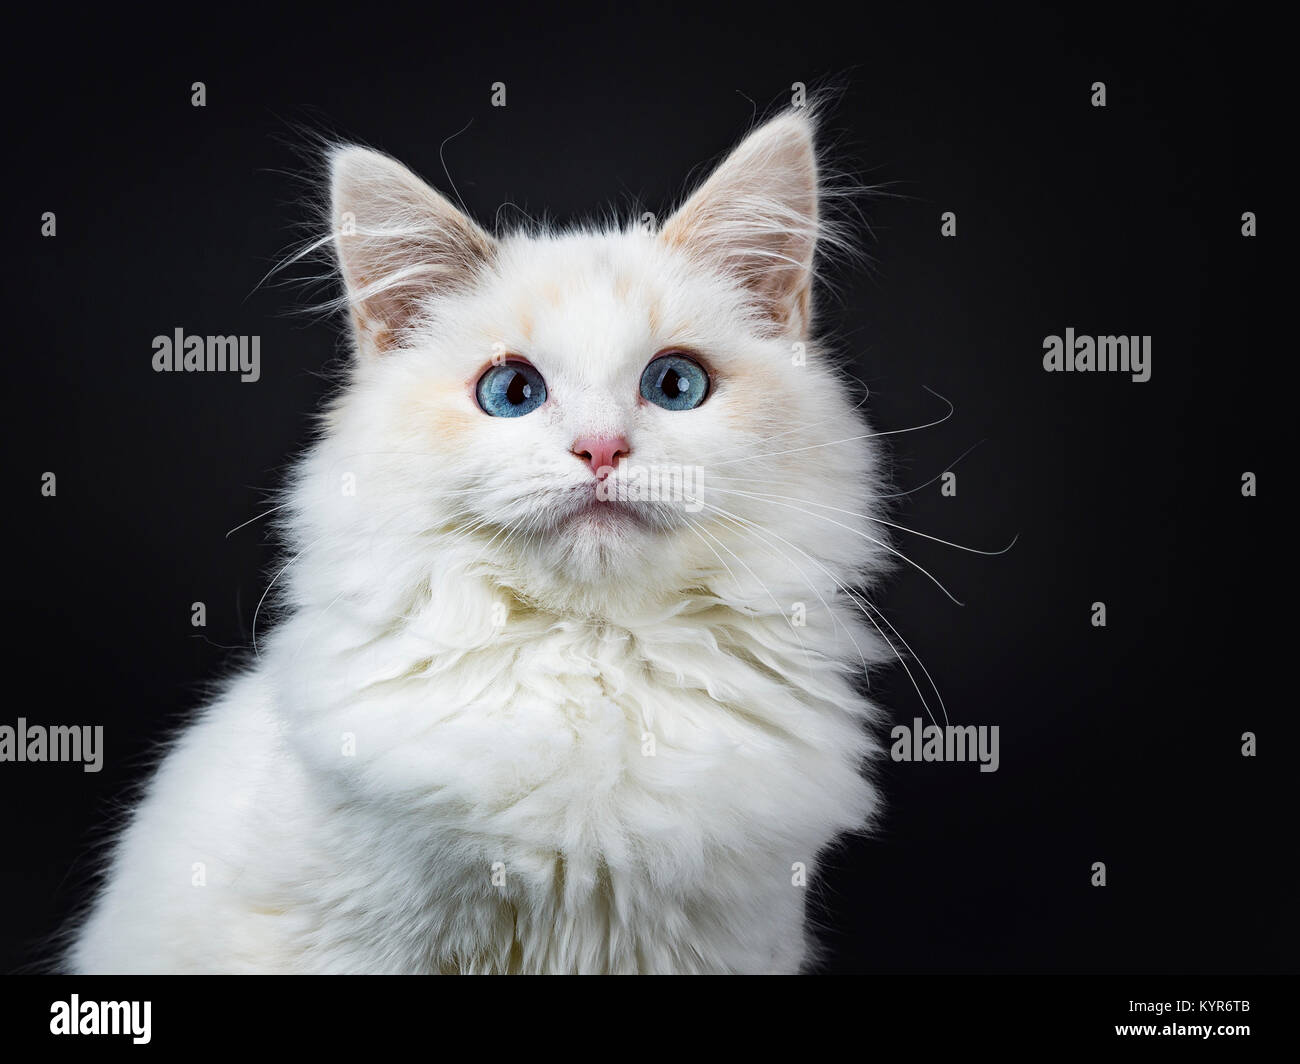 Purebred Ragdoll Cat Stock Photos & Purebred Ragdoll Cat